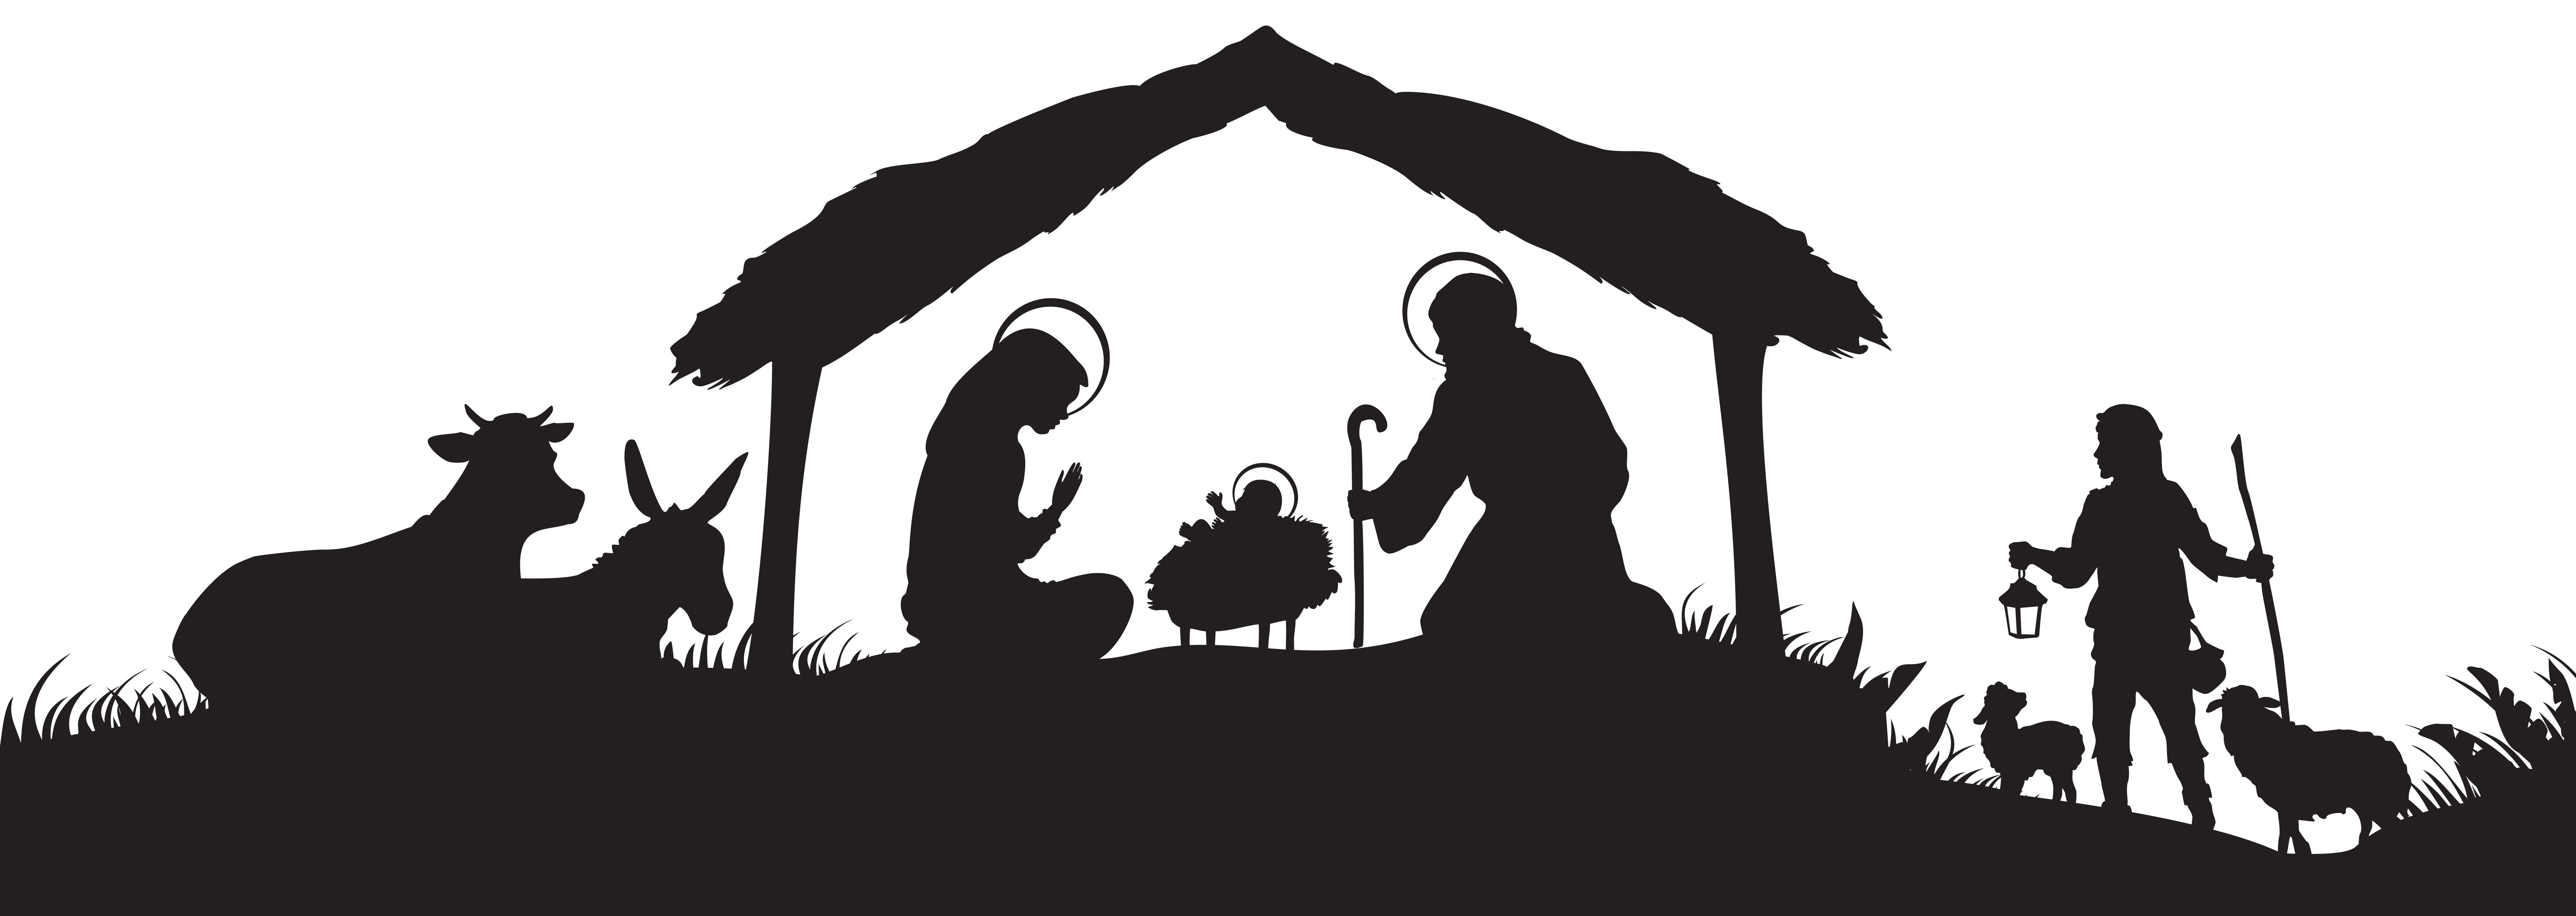 medium resolution of free christmas nativity clipart 18